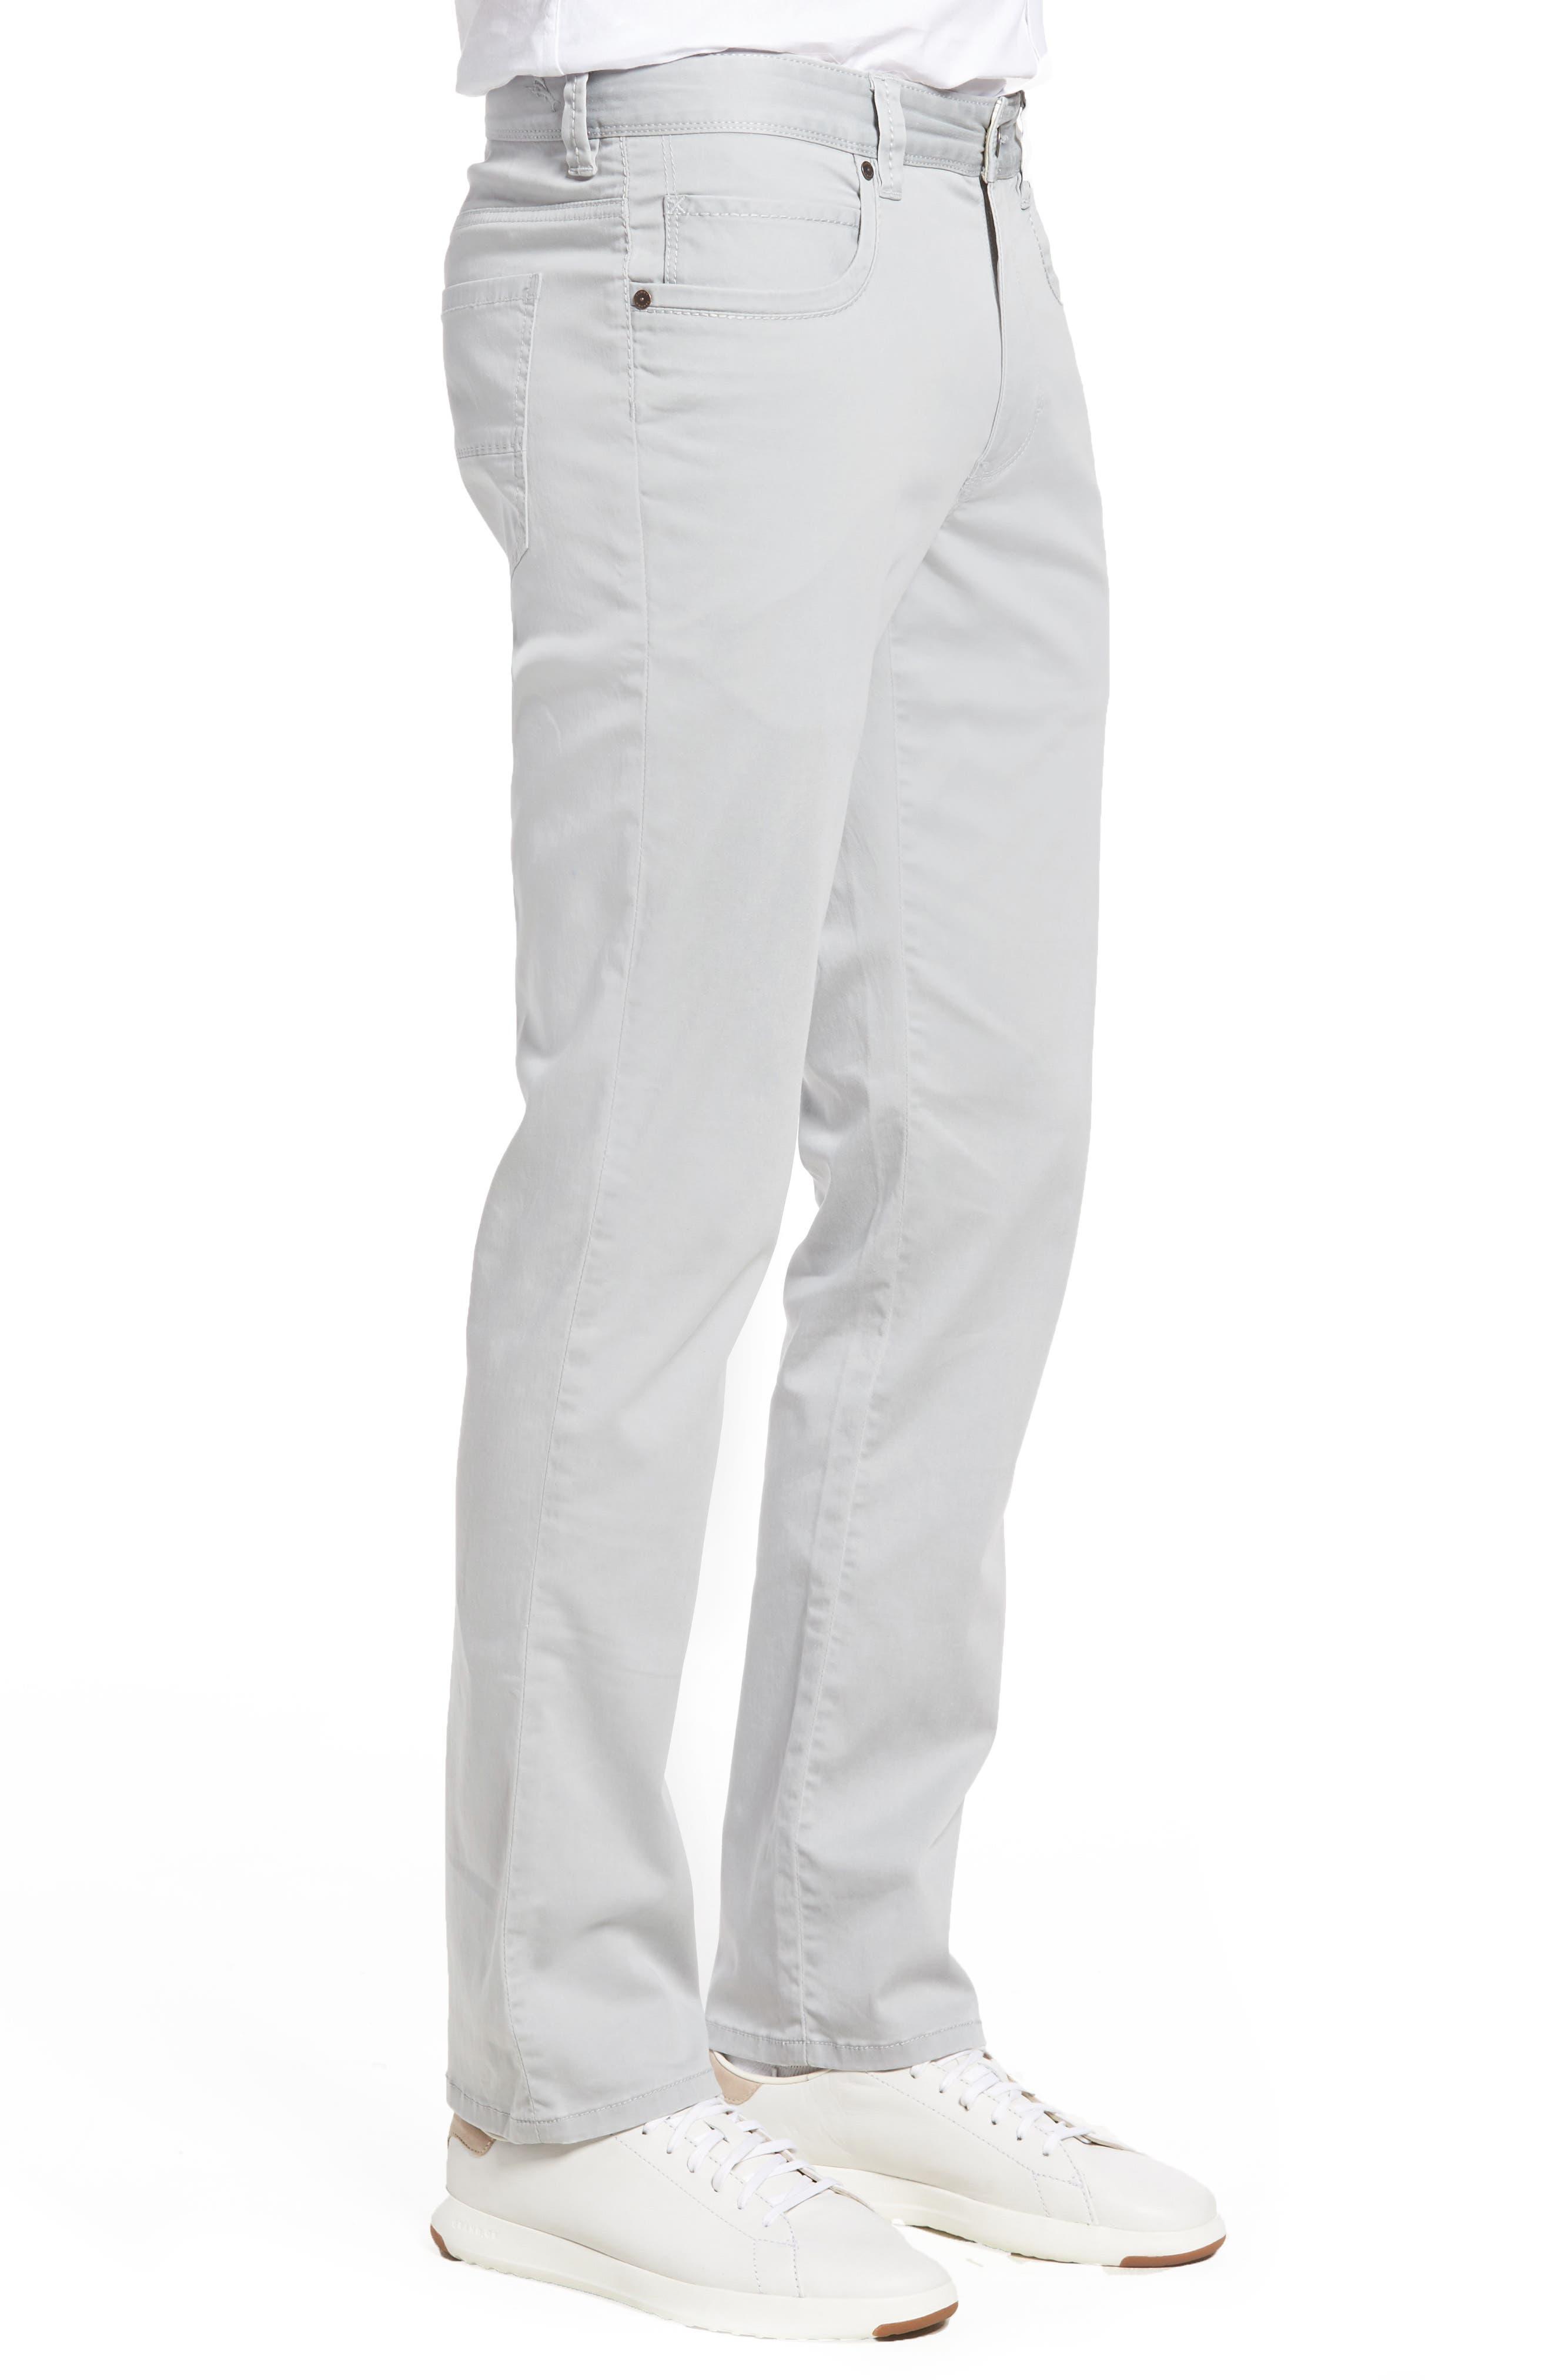 Boracay Pants,                             Alternate thumbnail 3, color,                             050